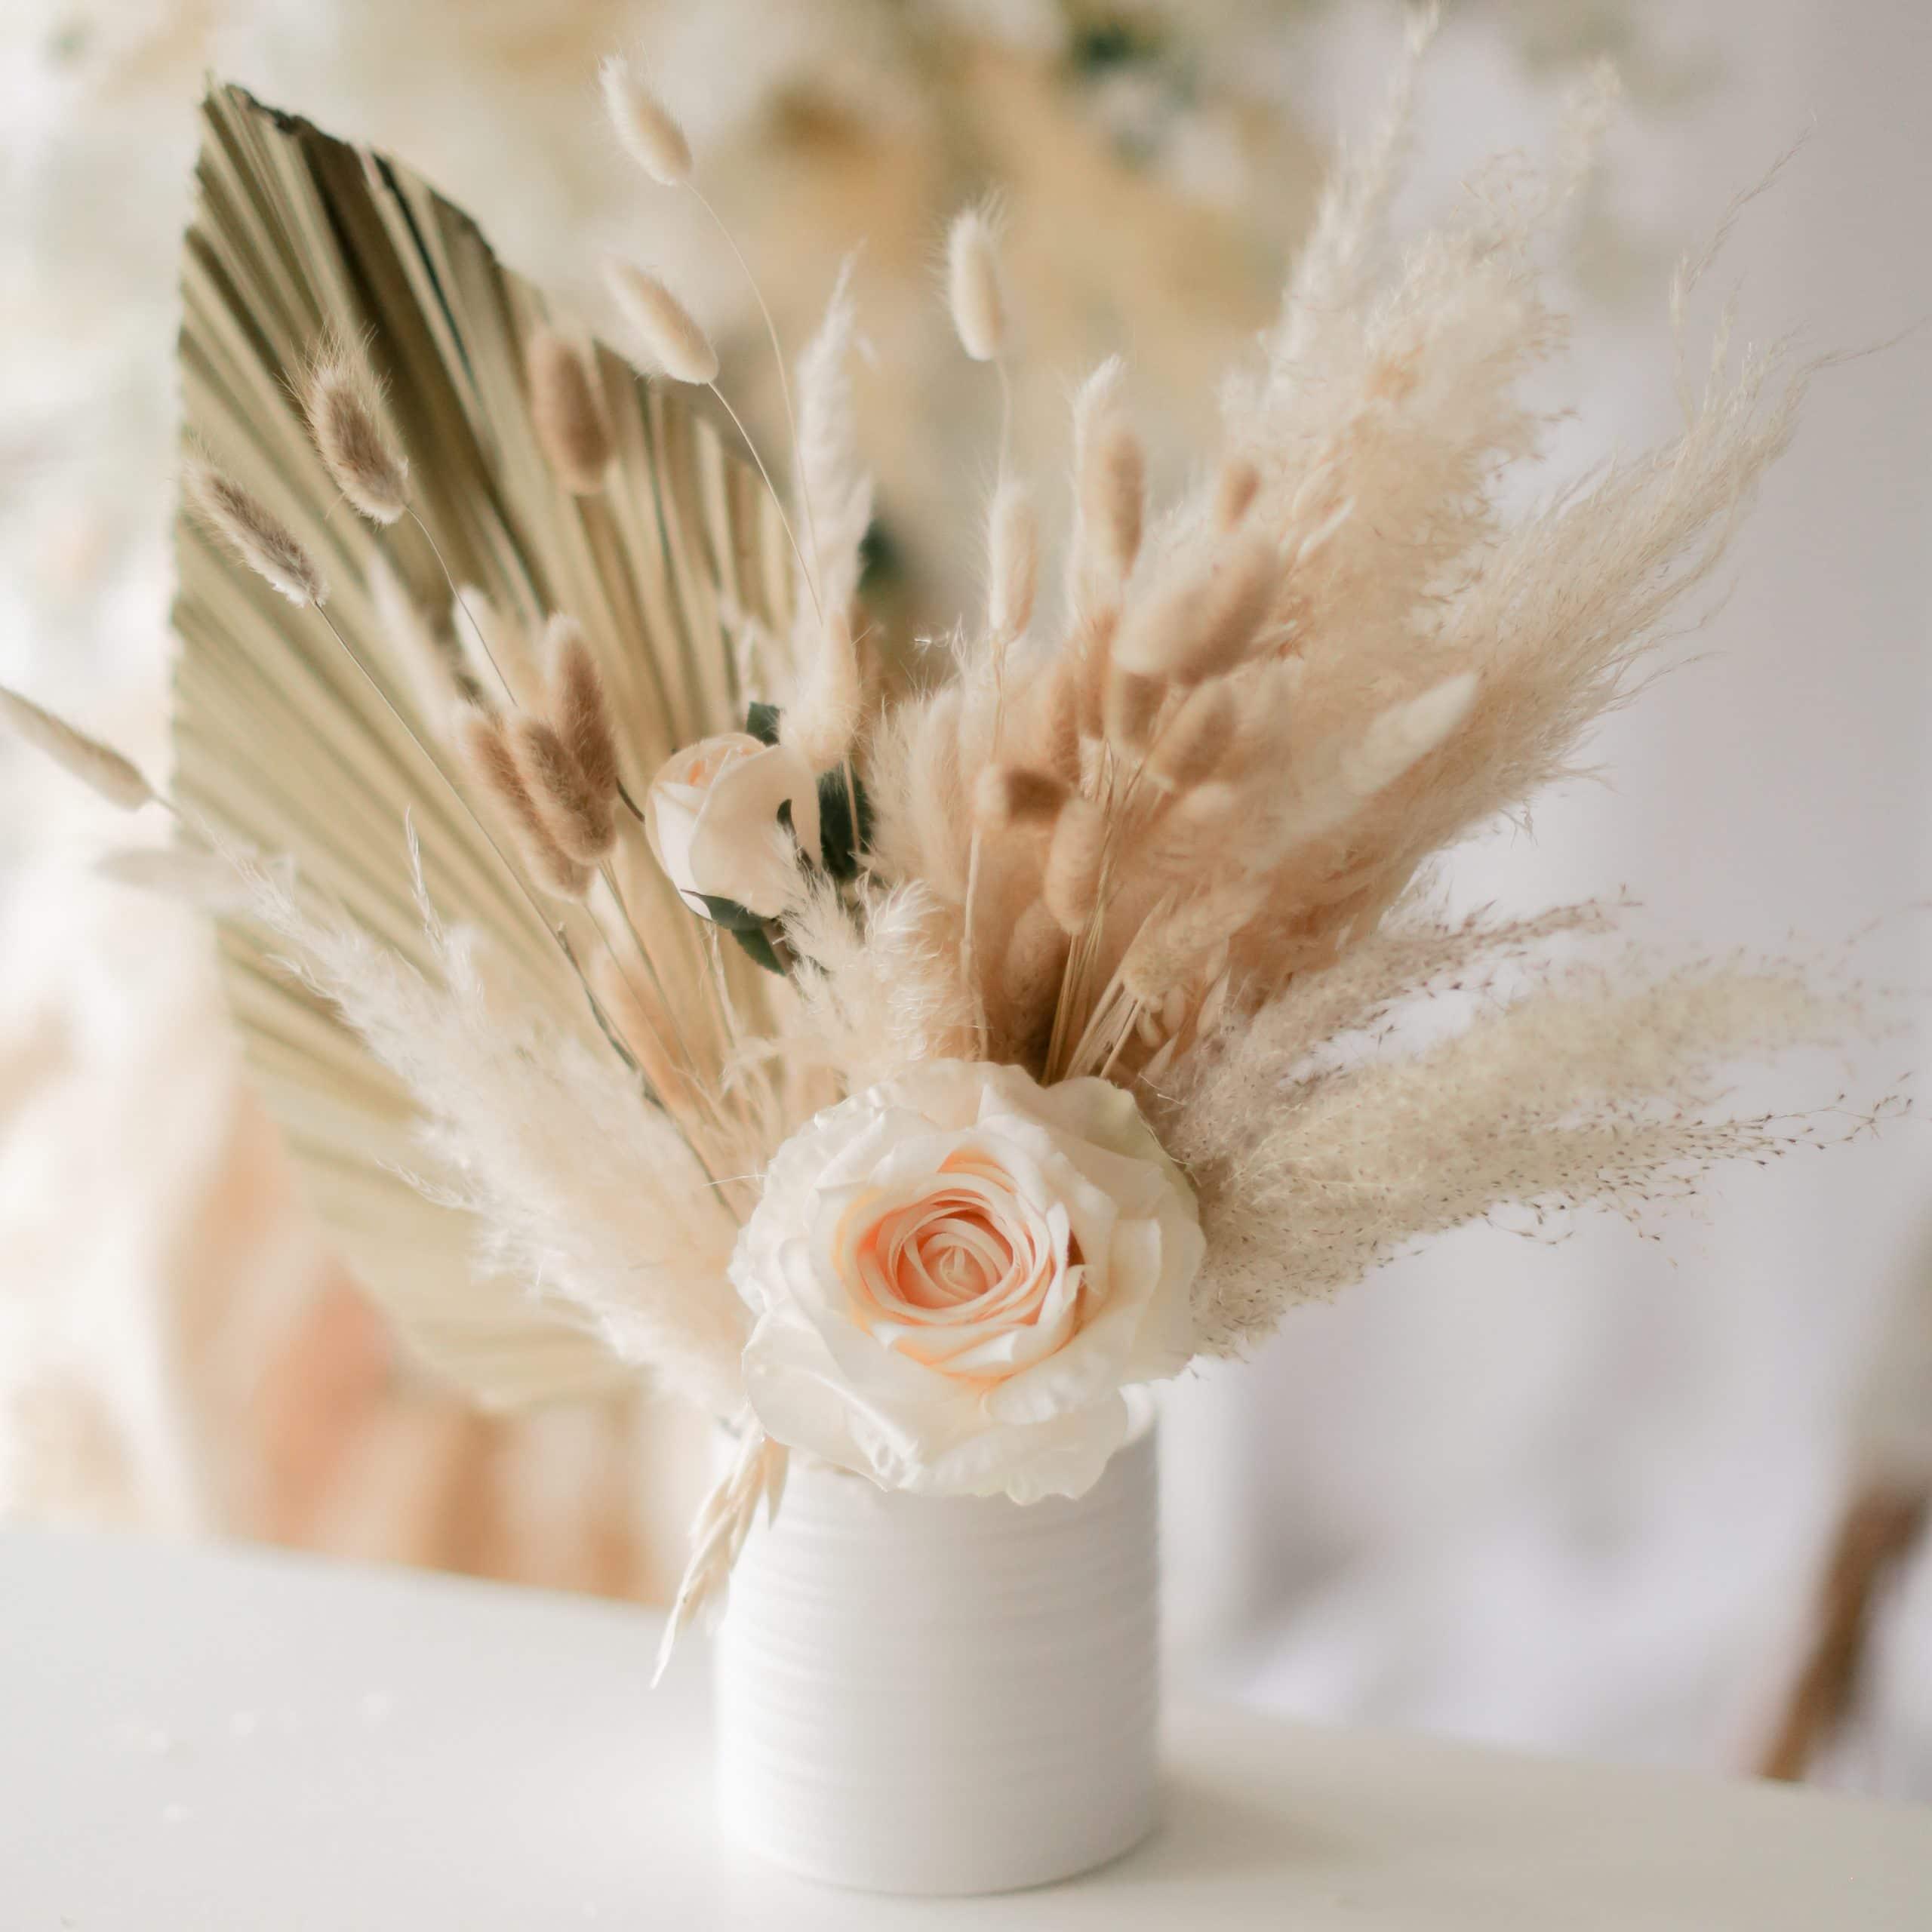 Lush Dried Flower Arrangement